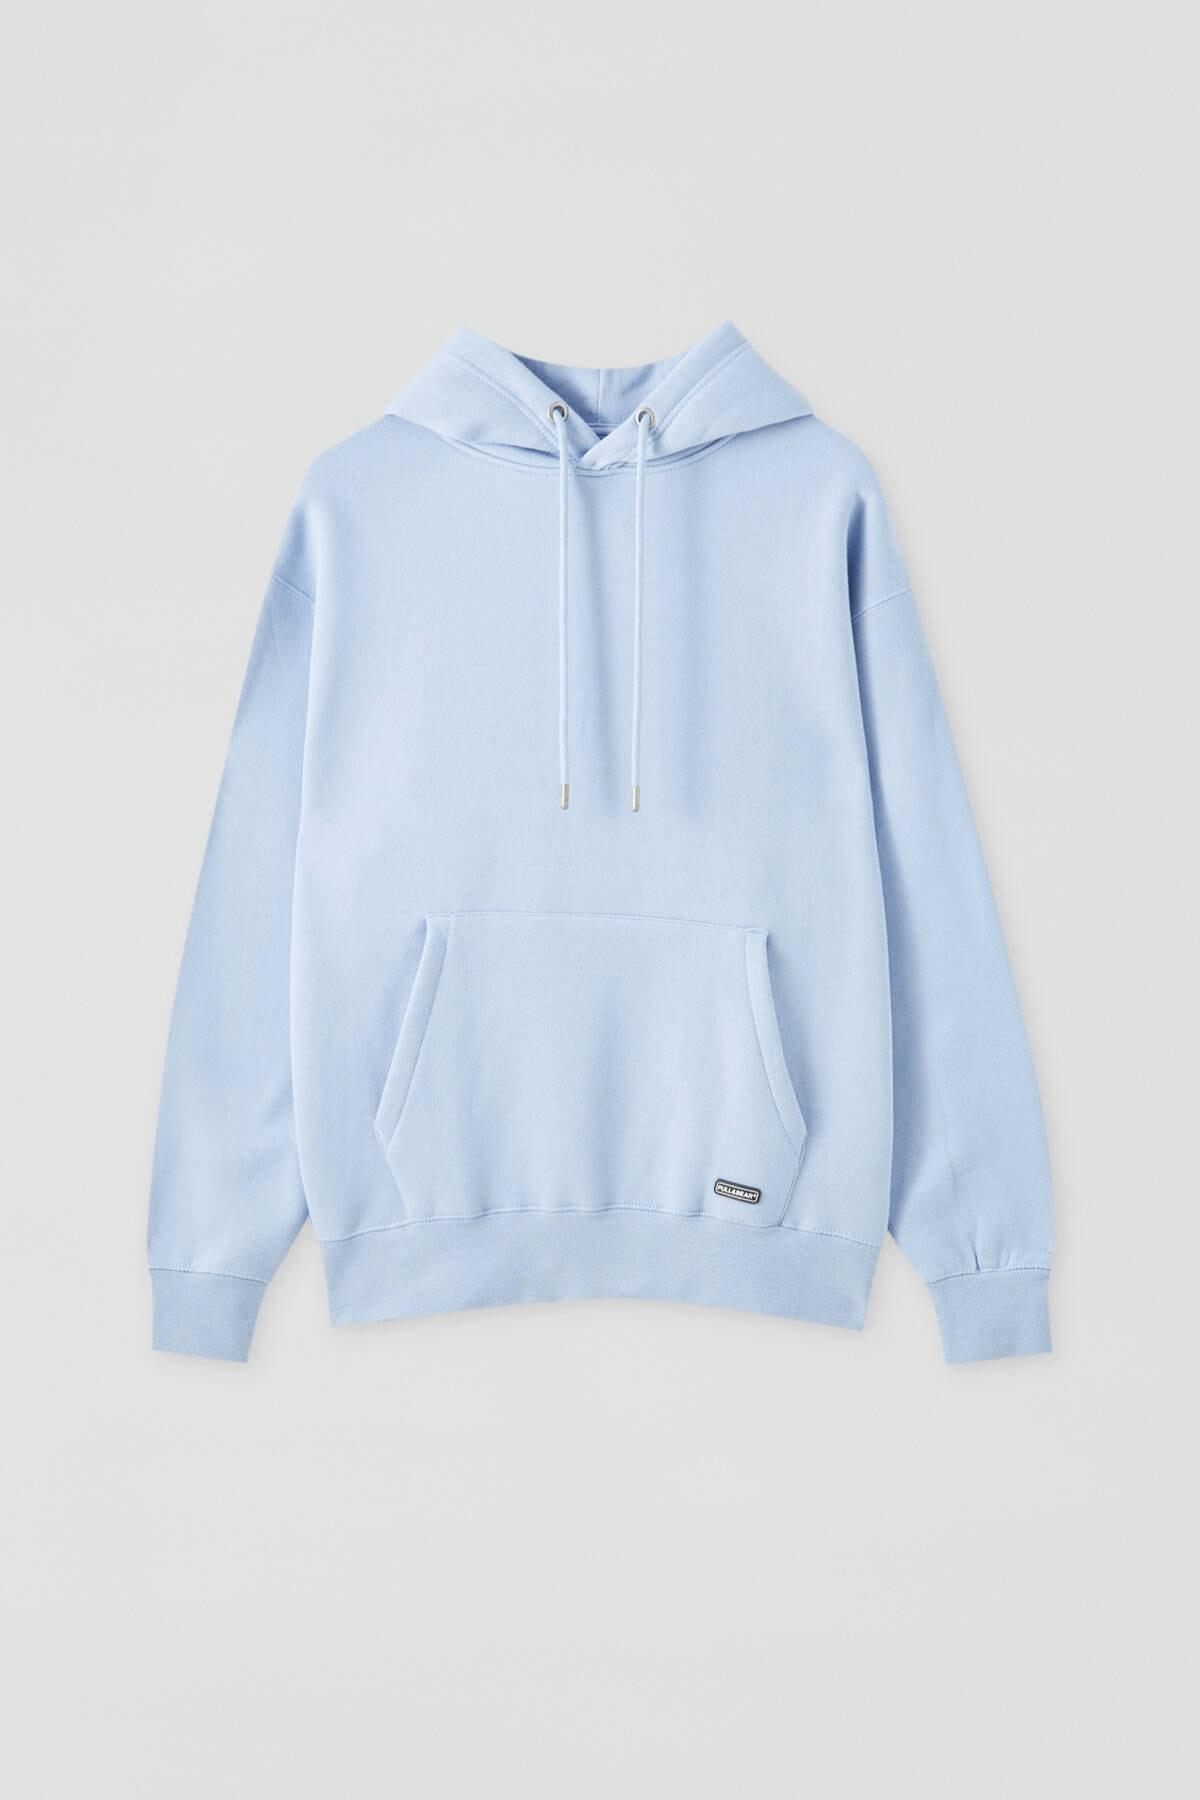 Pull & Bear Erkek Gök Mavisi Kapüşonlu Kanguru Cepli Basic Sweatshirt 09594513 4